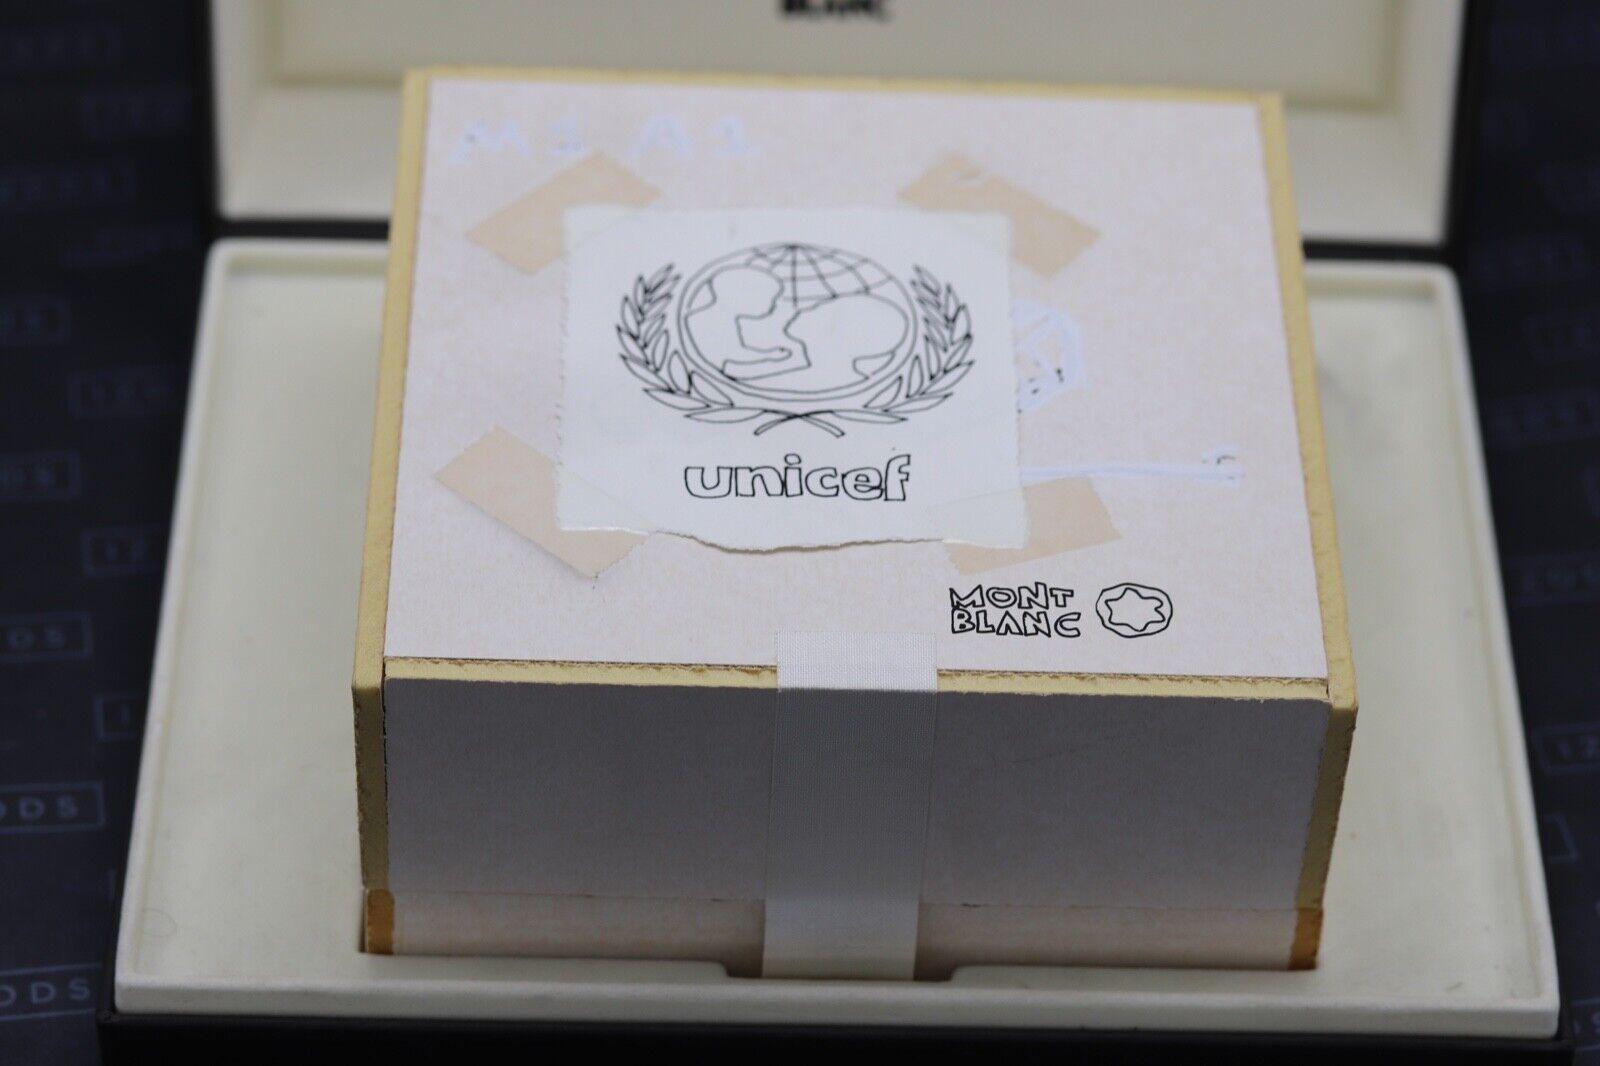 Montblanc Meisterstuck 149 Tom Sachs UNICEF Fountain Pen Set - UNUSED 9